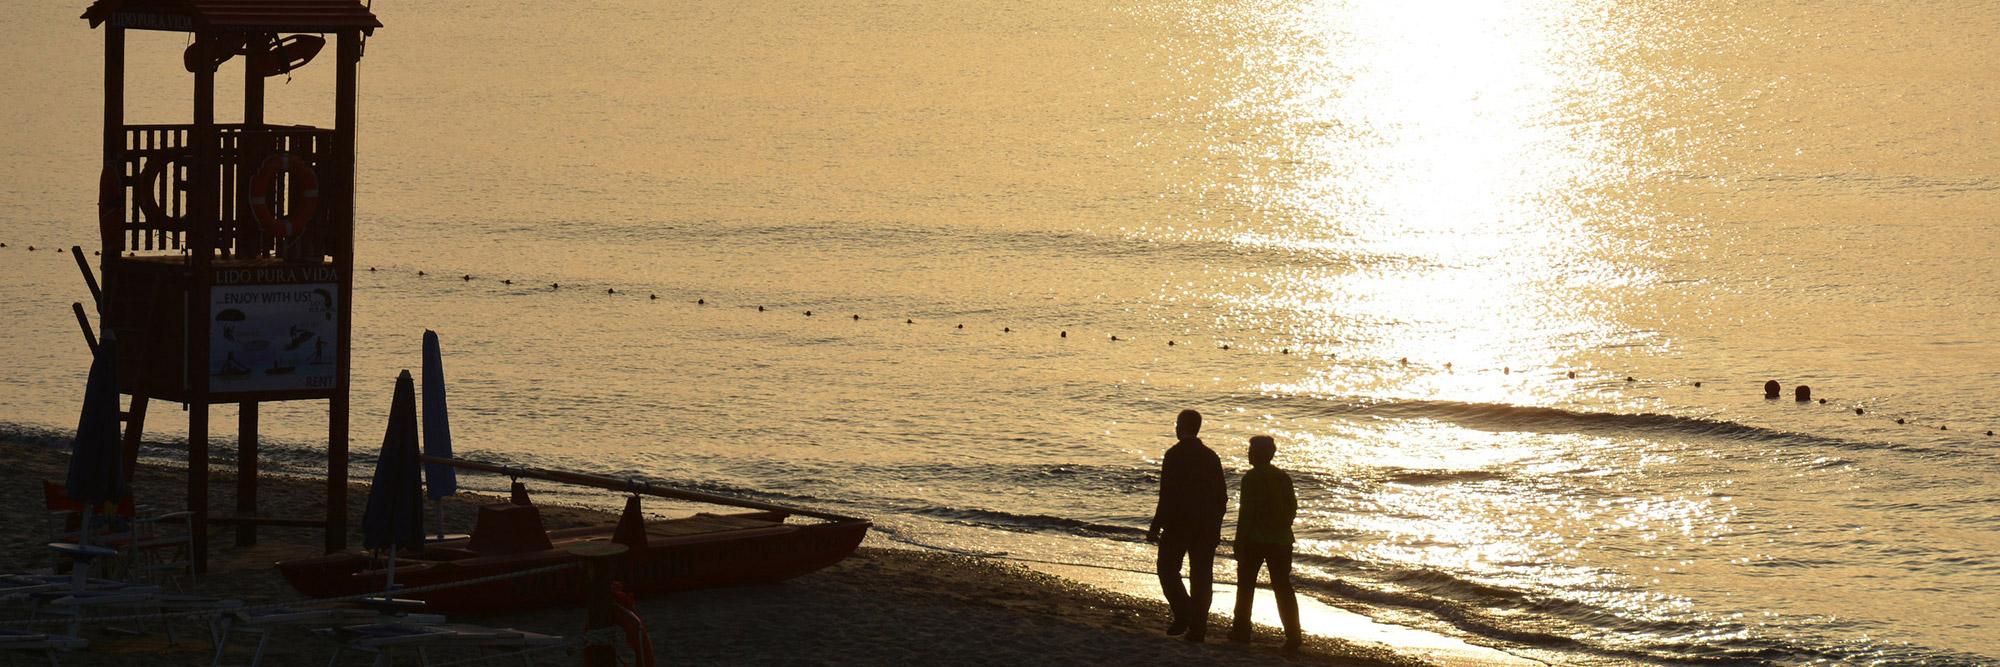 cefalu-lungomare-spiaggia-tramonto-sunset-magazine